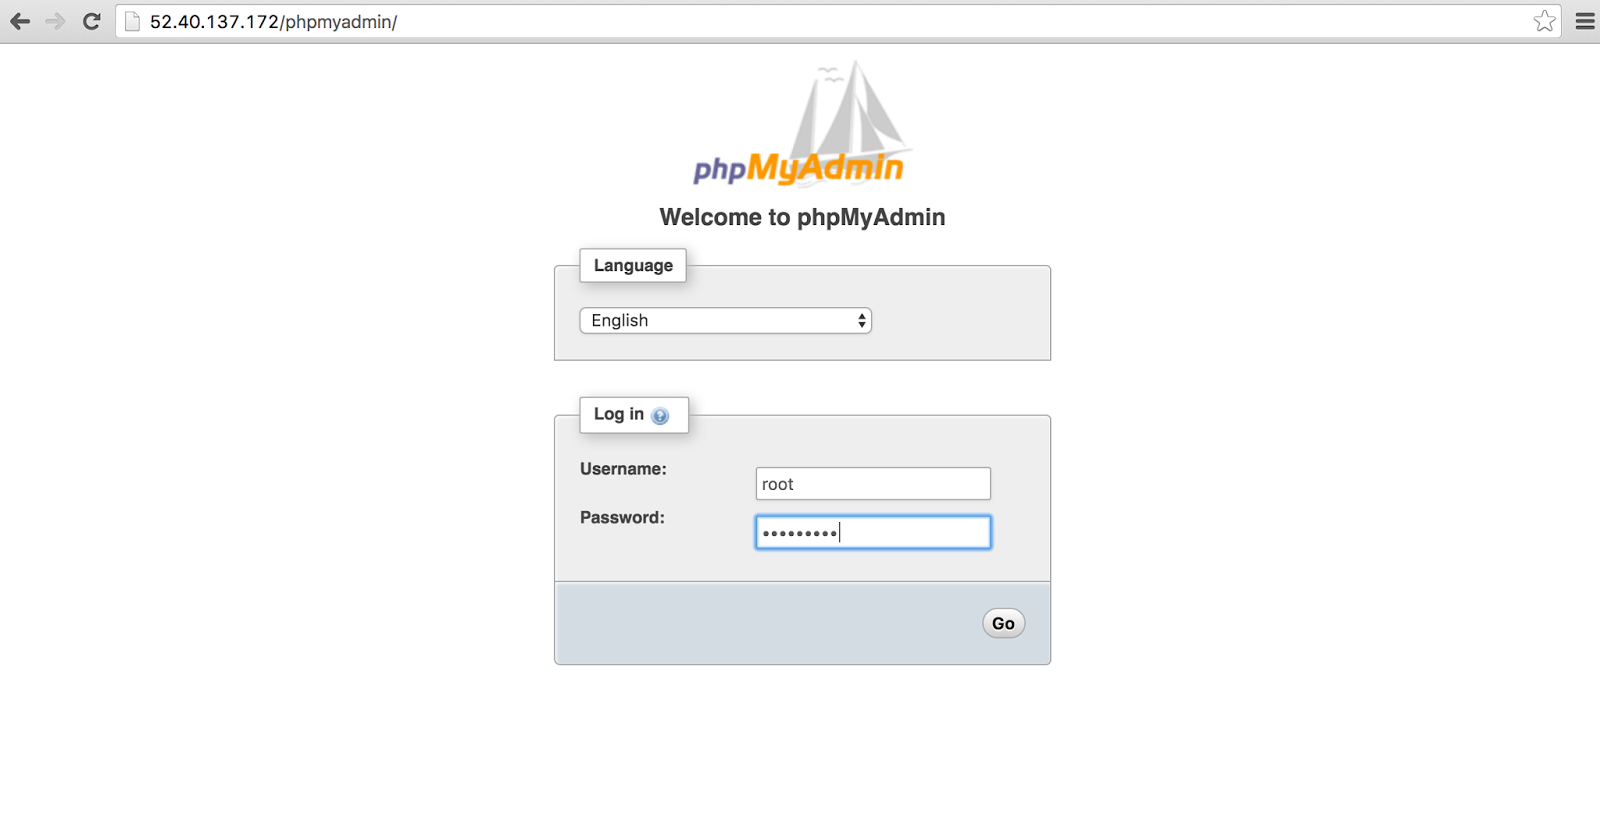 phpmyadmin display